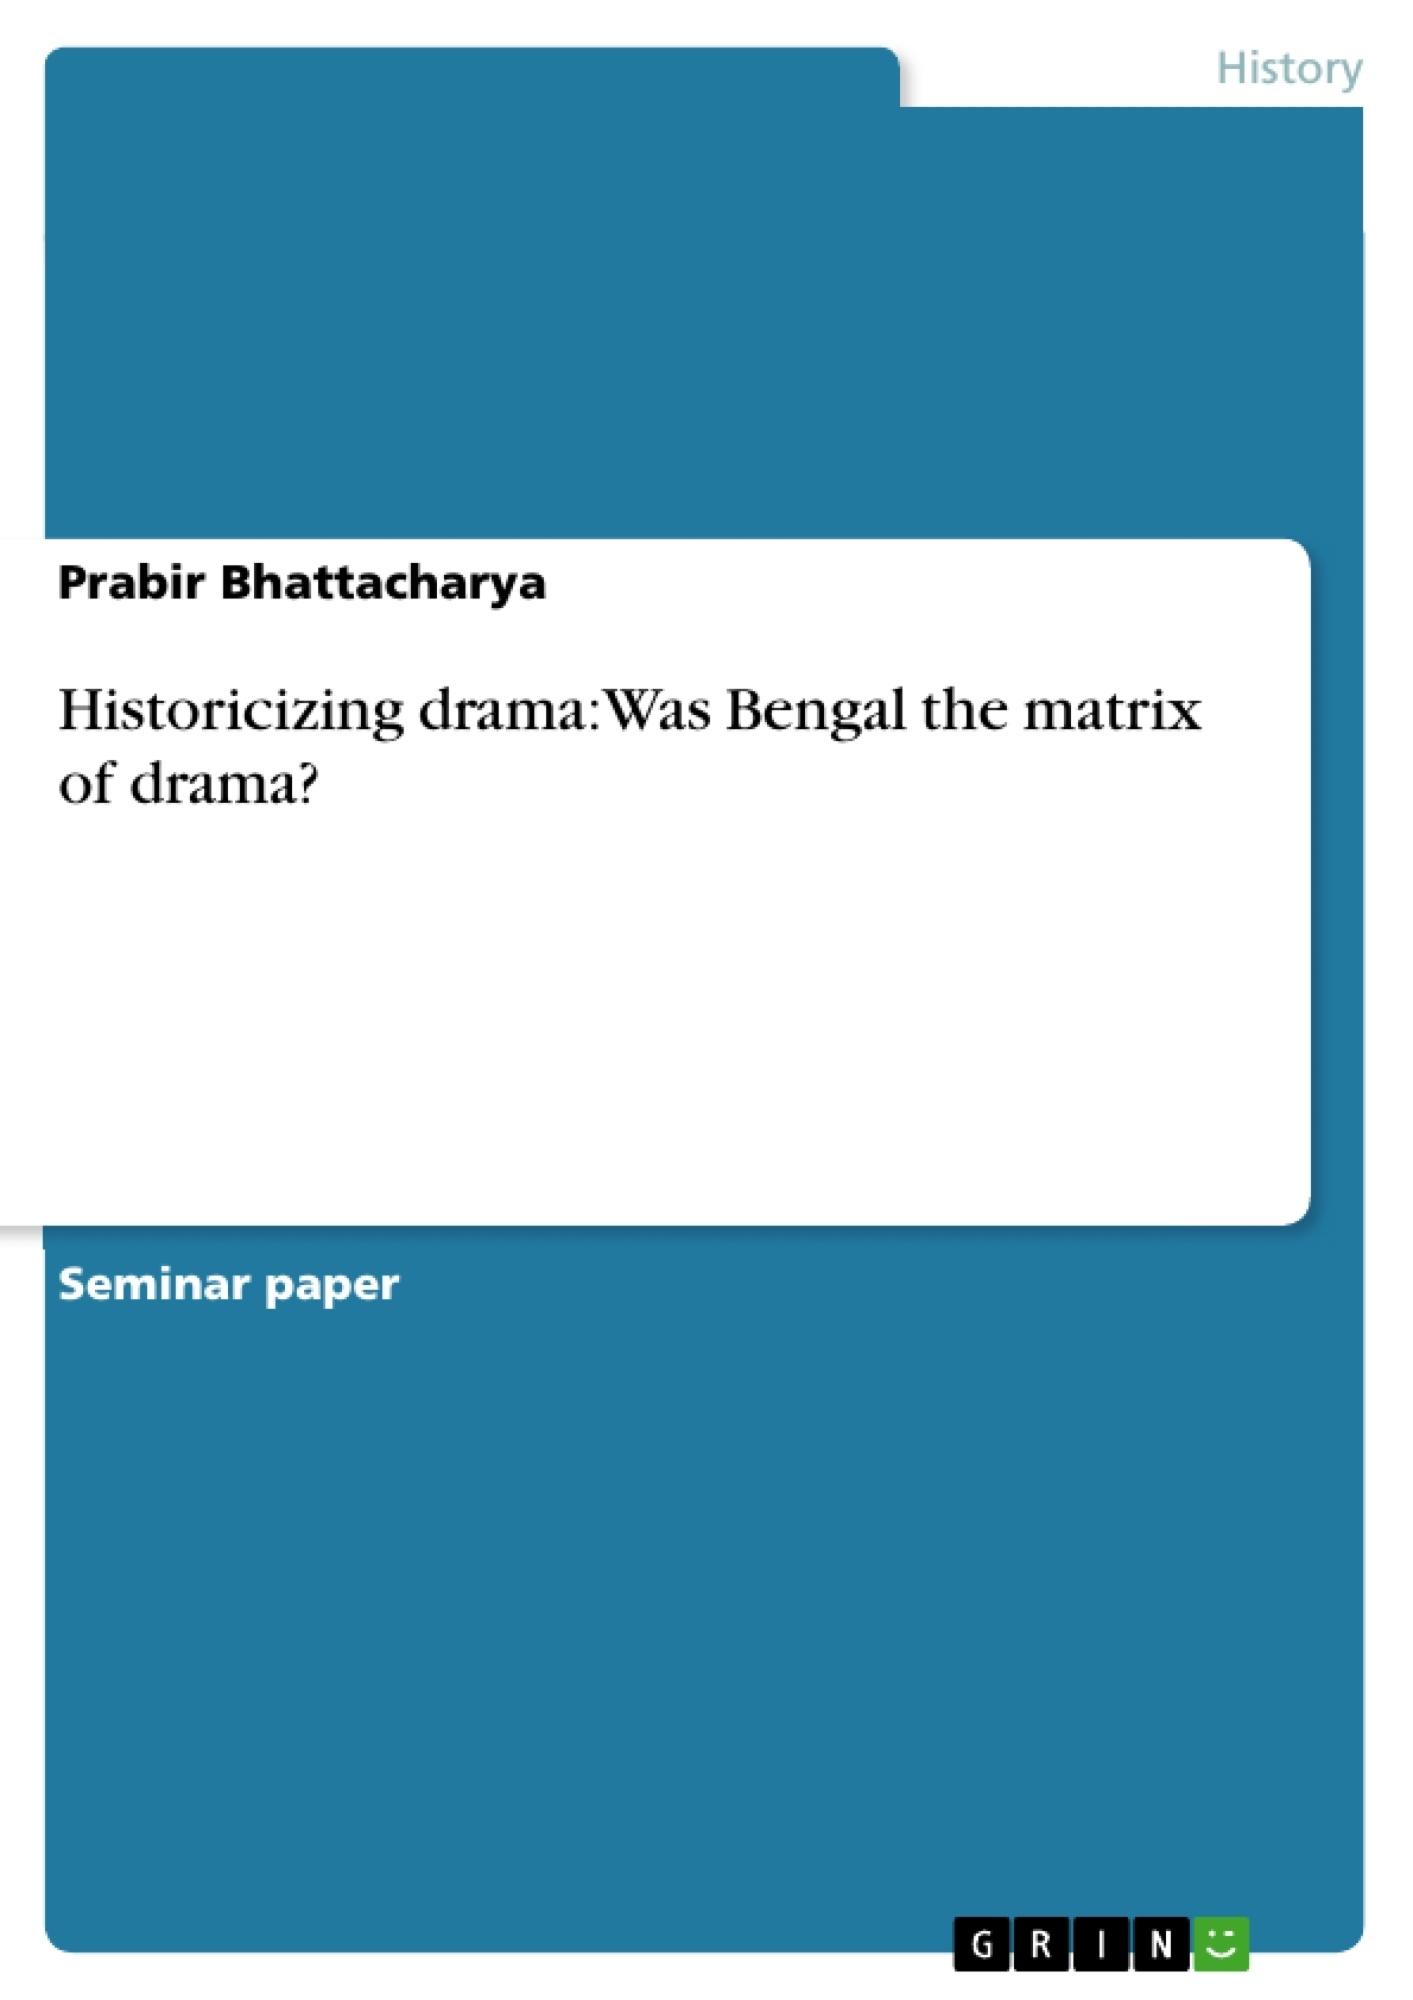 Title: Historicizing drama: Was Bengal the matrix of drama?